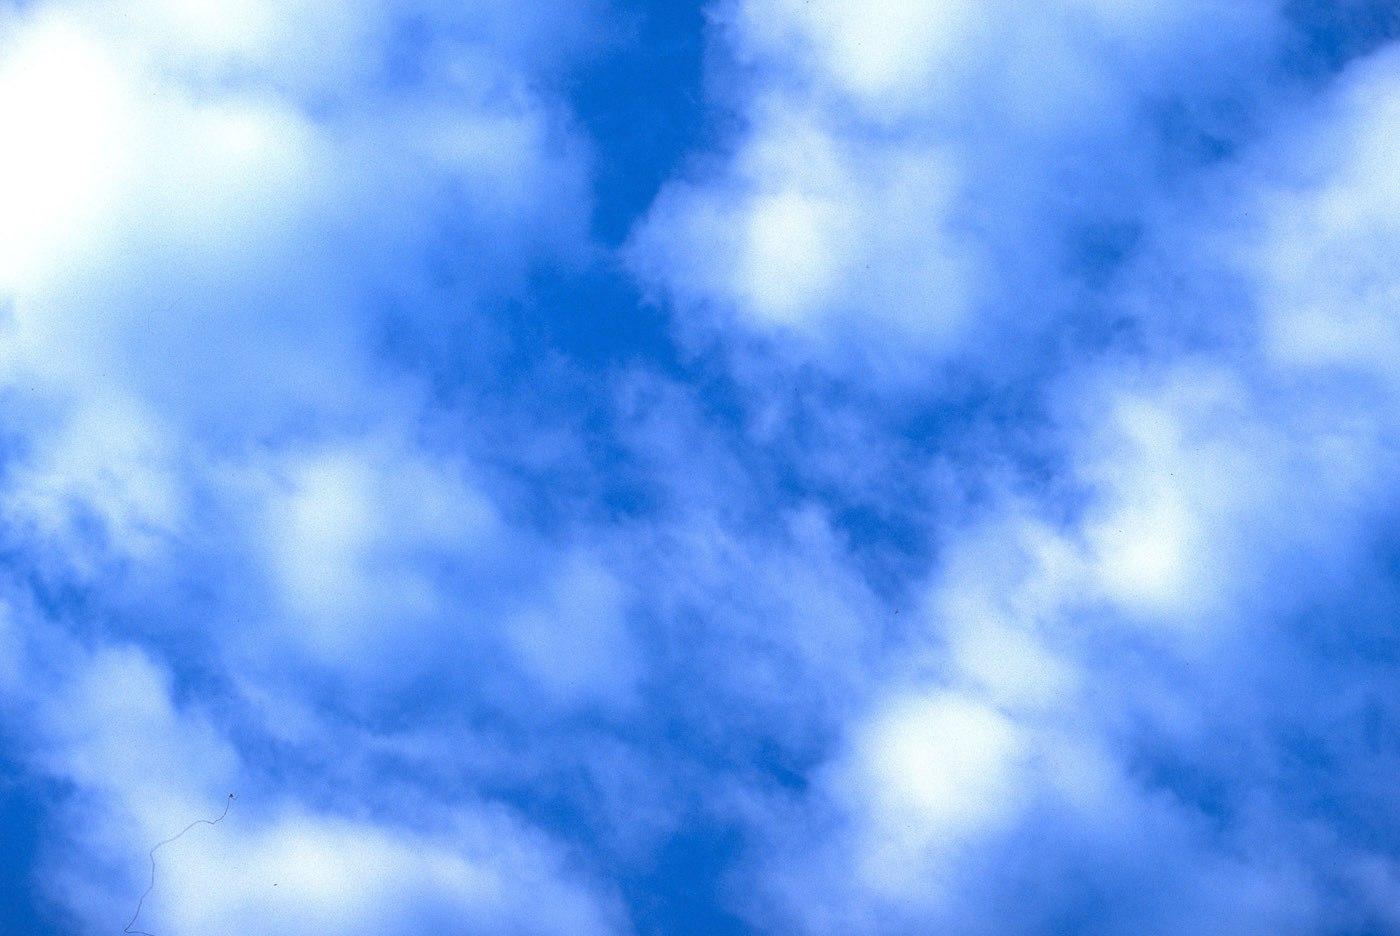 Blue Skies Ahead for Dell, EMC, and Virtustream's Hybrid Cloud